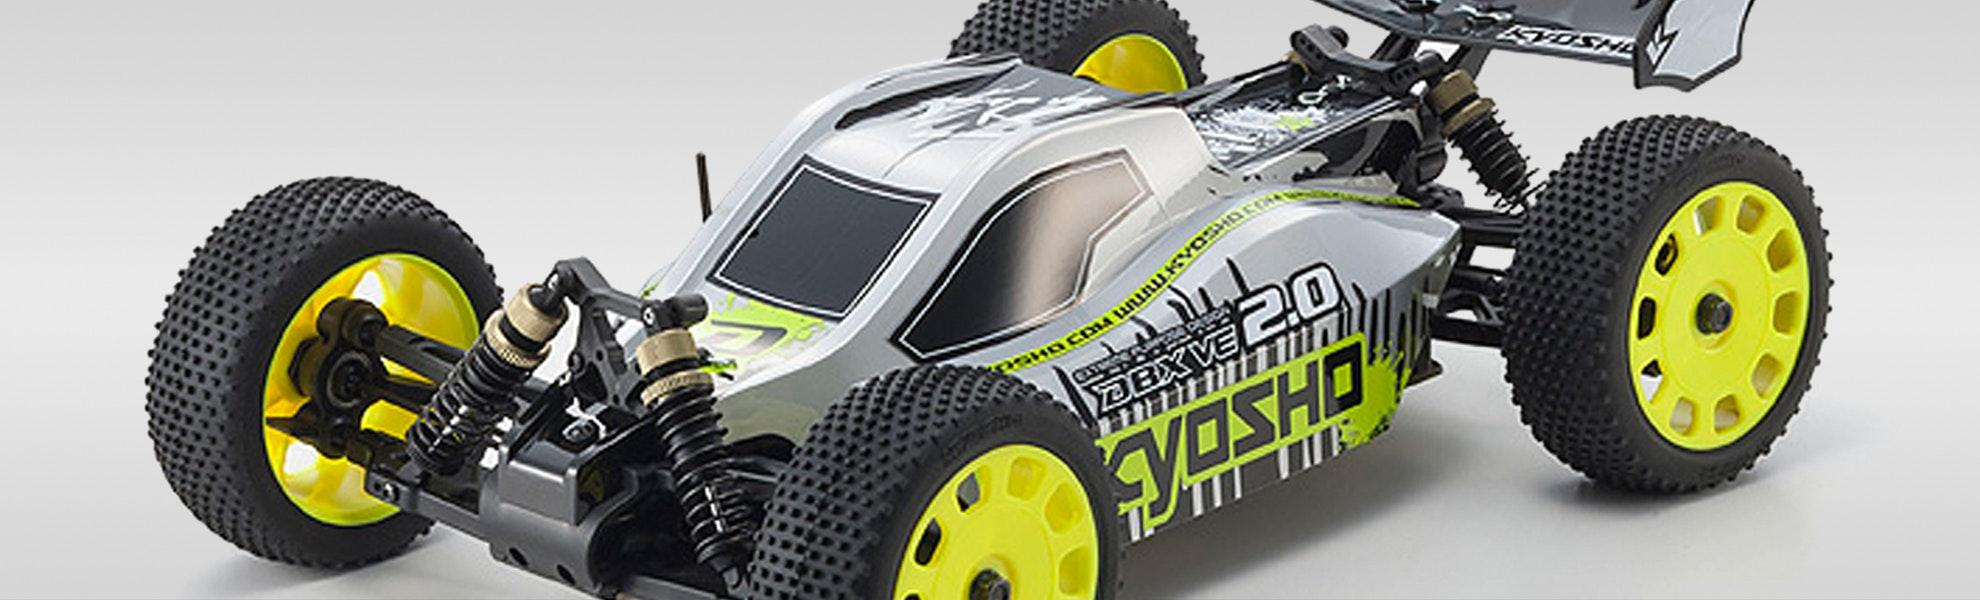 Kyosho DBX VE 2.0 1/10 Readyset 4WD Buggy RTR